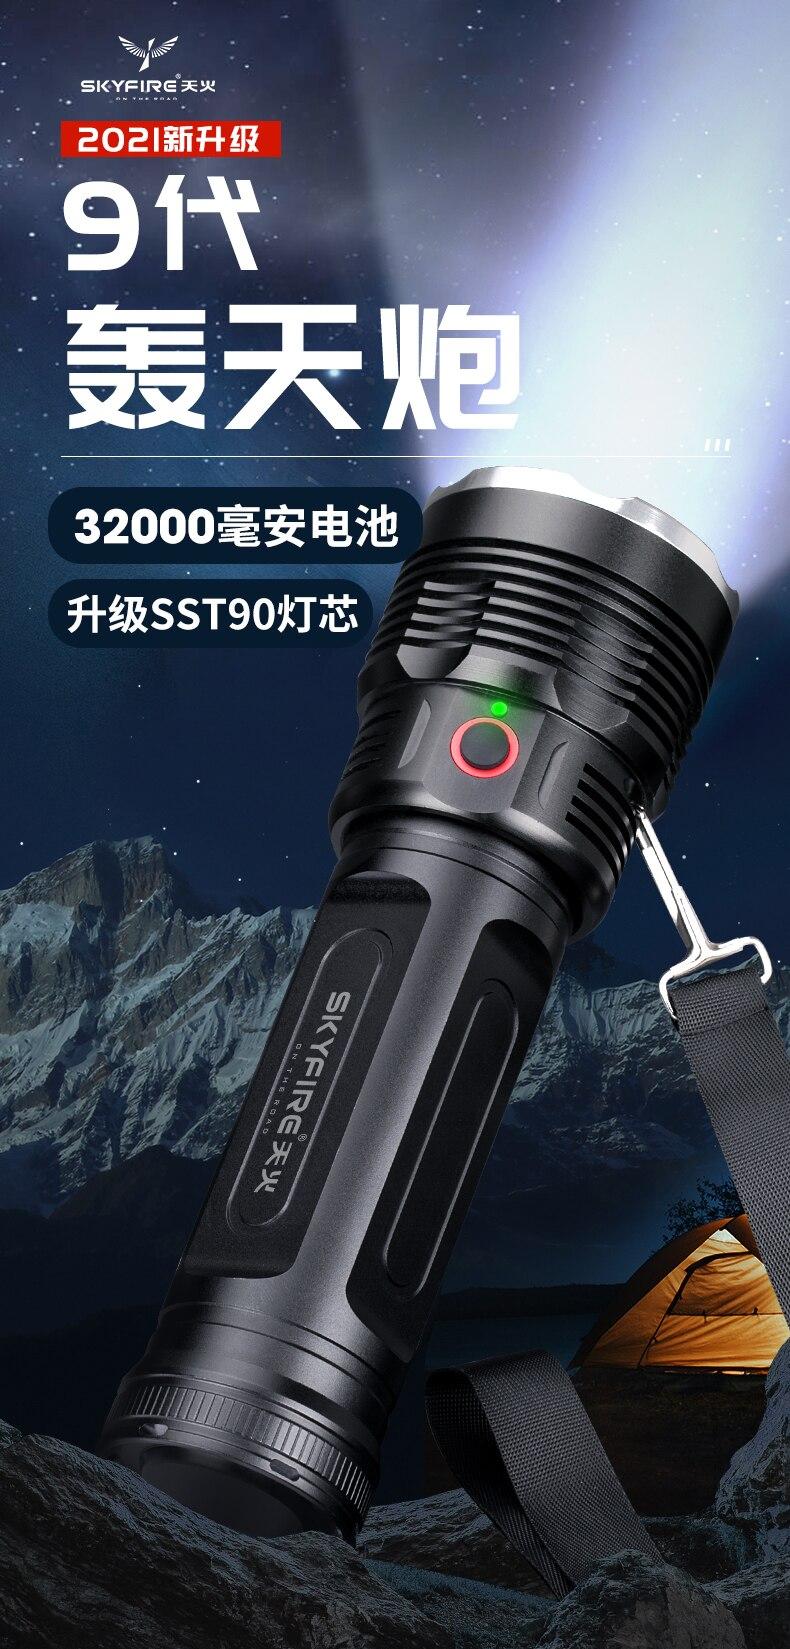 Portable Outdoor Flashlight Button Powerful Convoy Mini Lanterna Flashlight Rechargeable Light Linternas Camping Supplies BI50FL enlarge